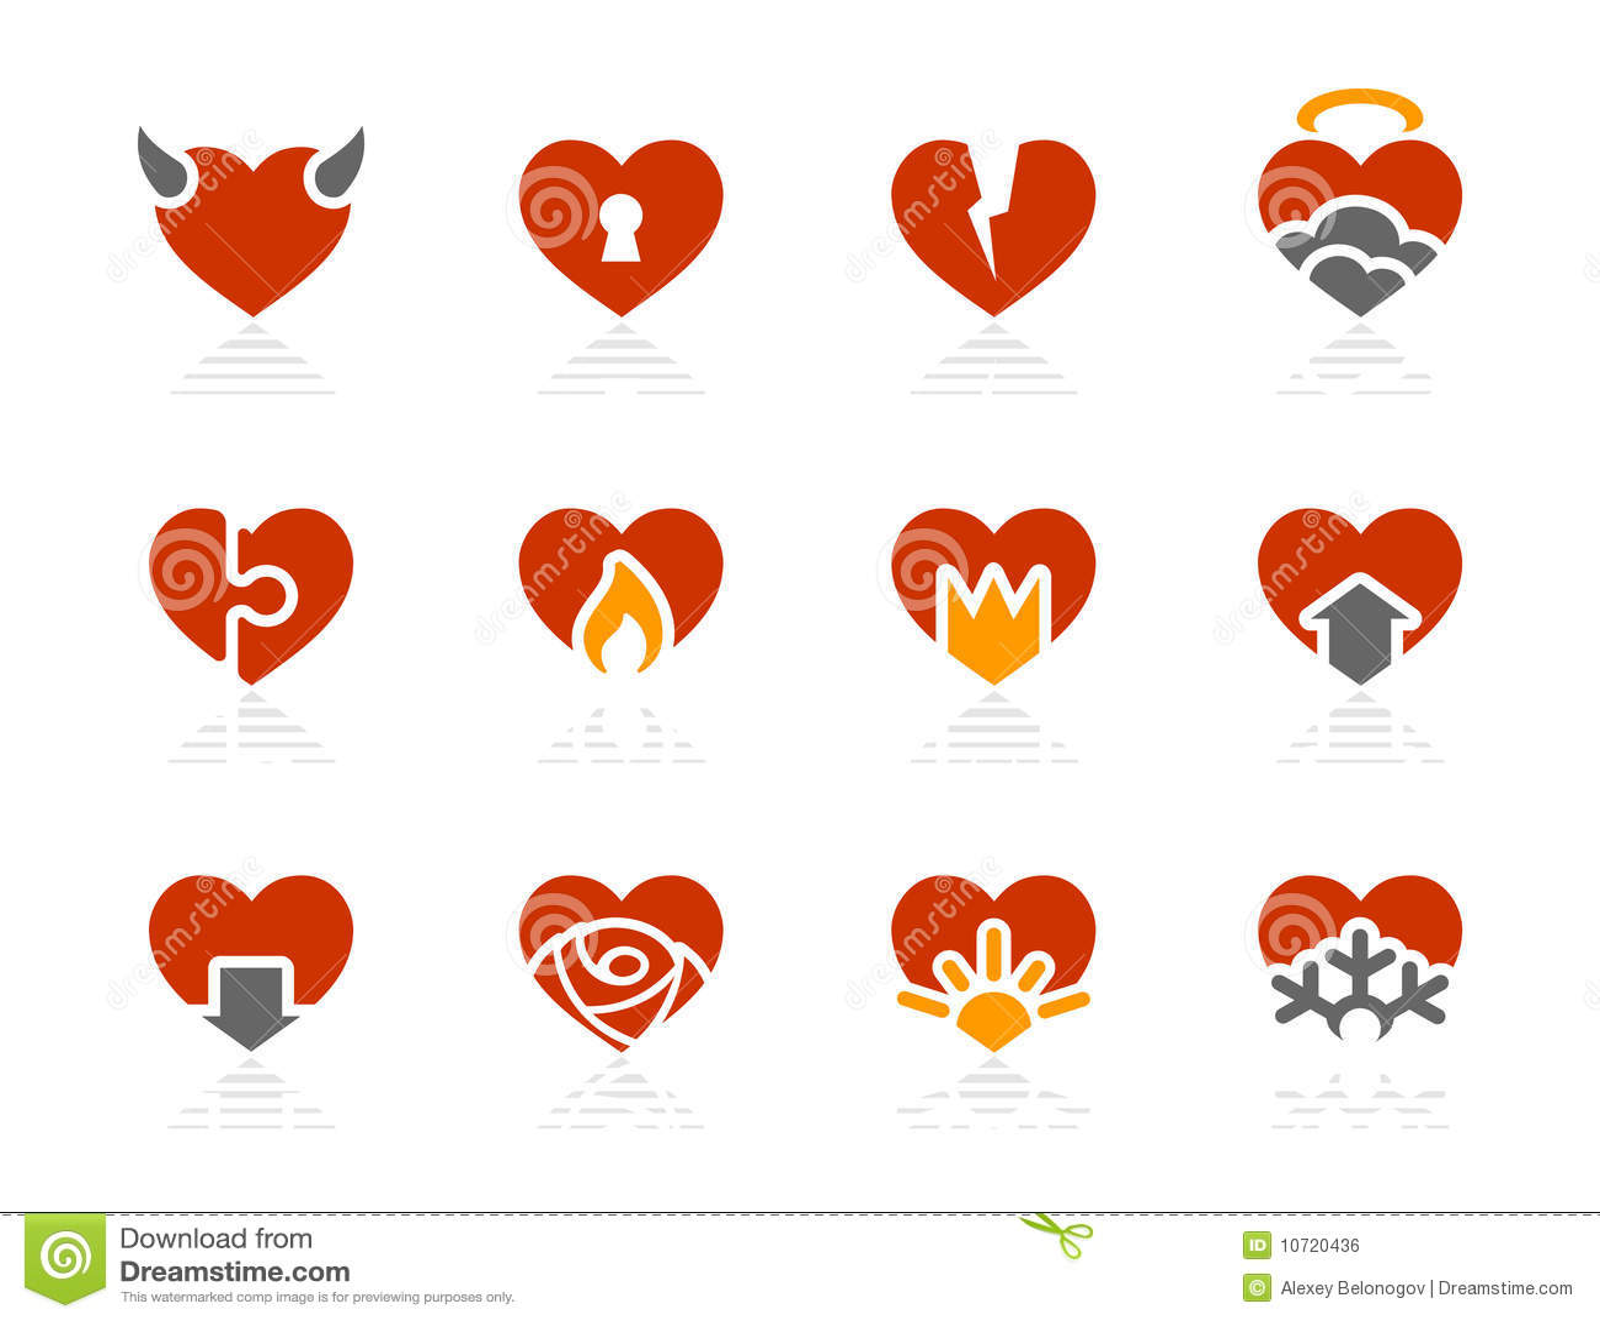 Hearts icons | Sunshine Hotel series